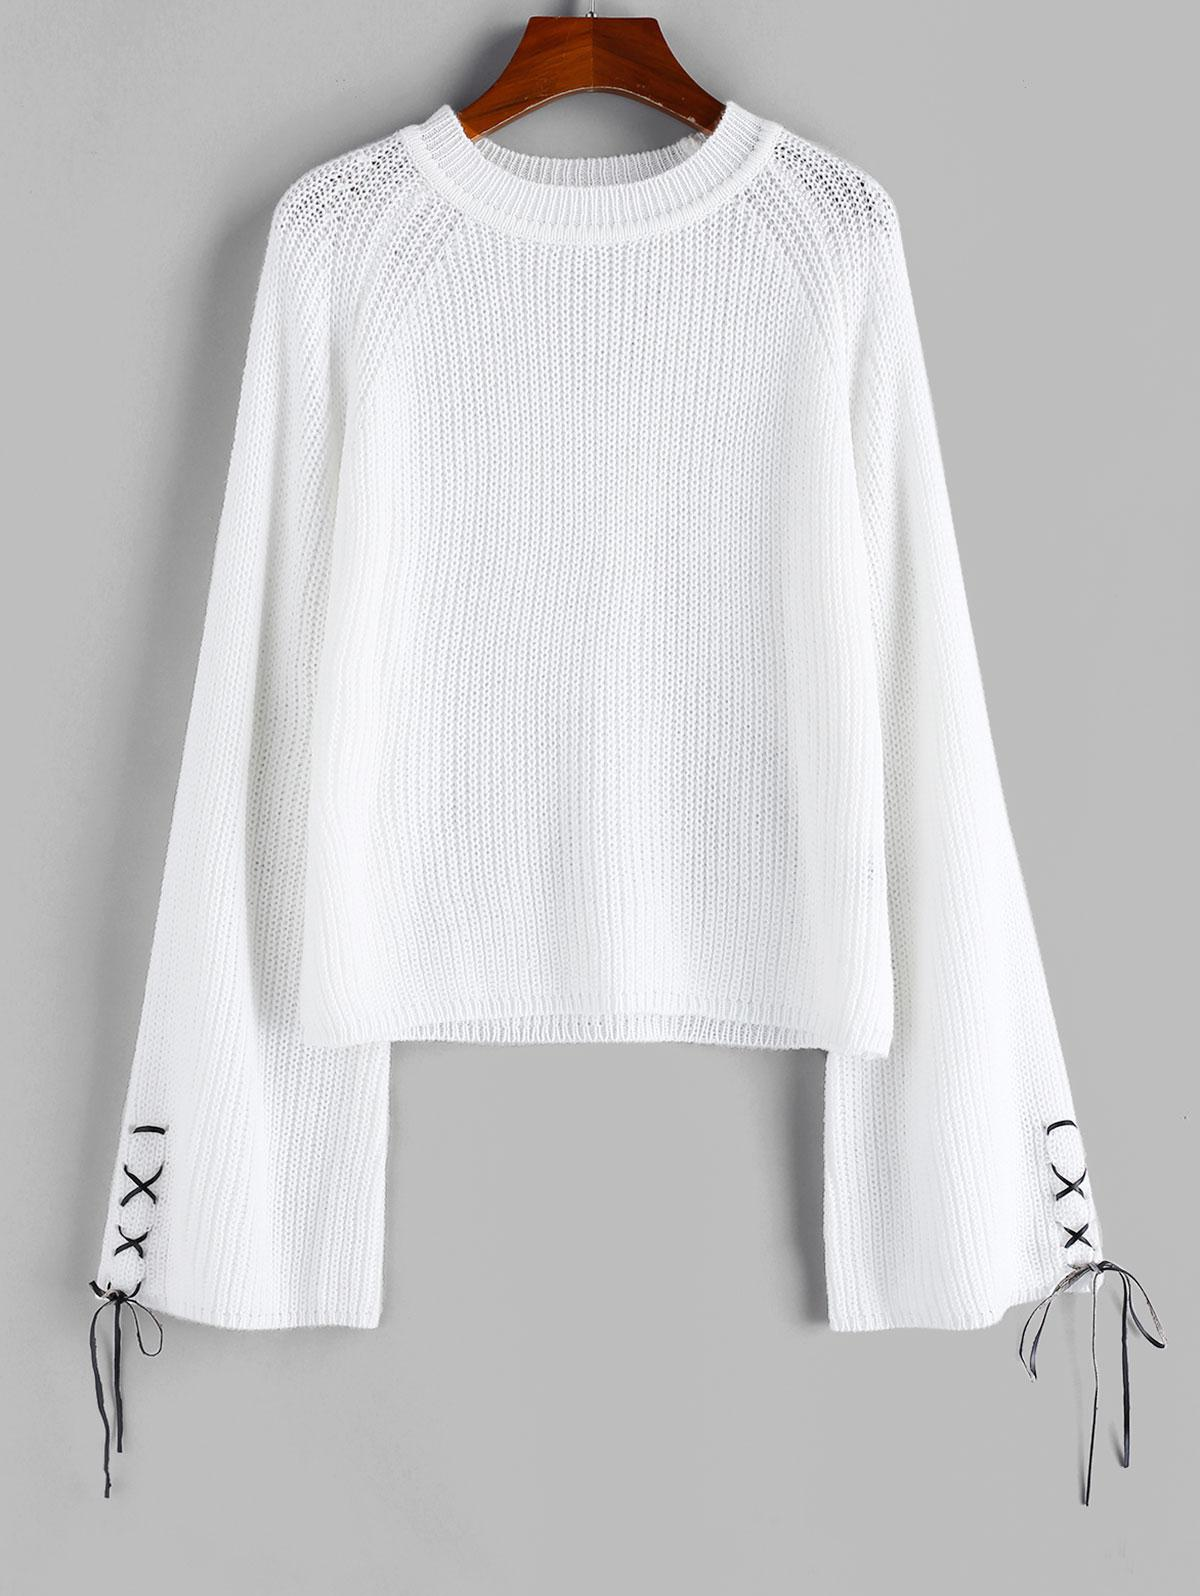 ZAFUL Lace Up Raglan Sleeve Jumper Sweater